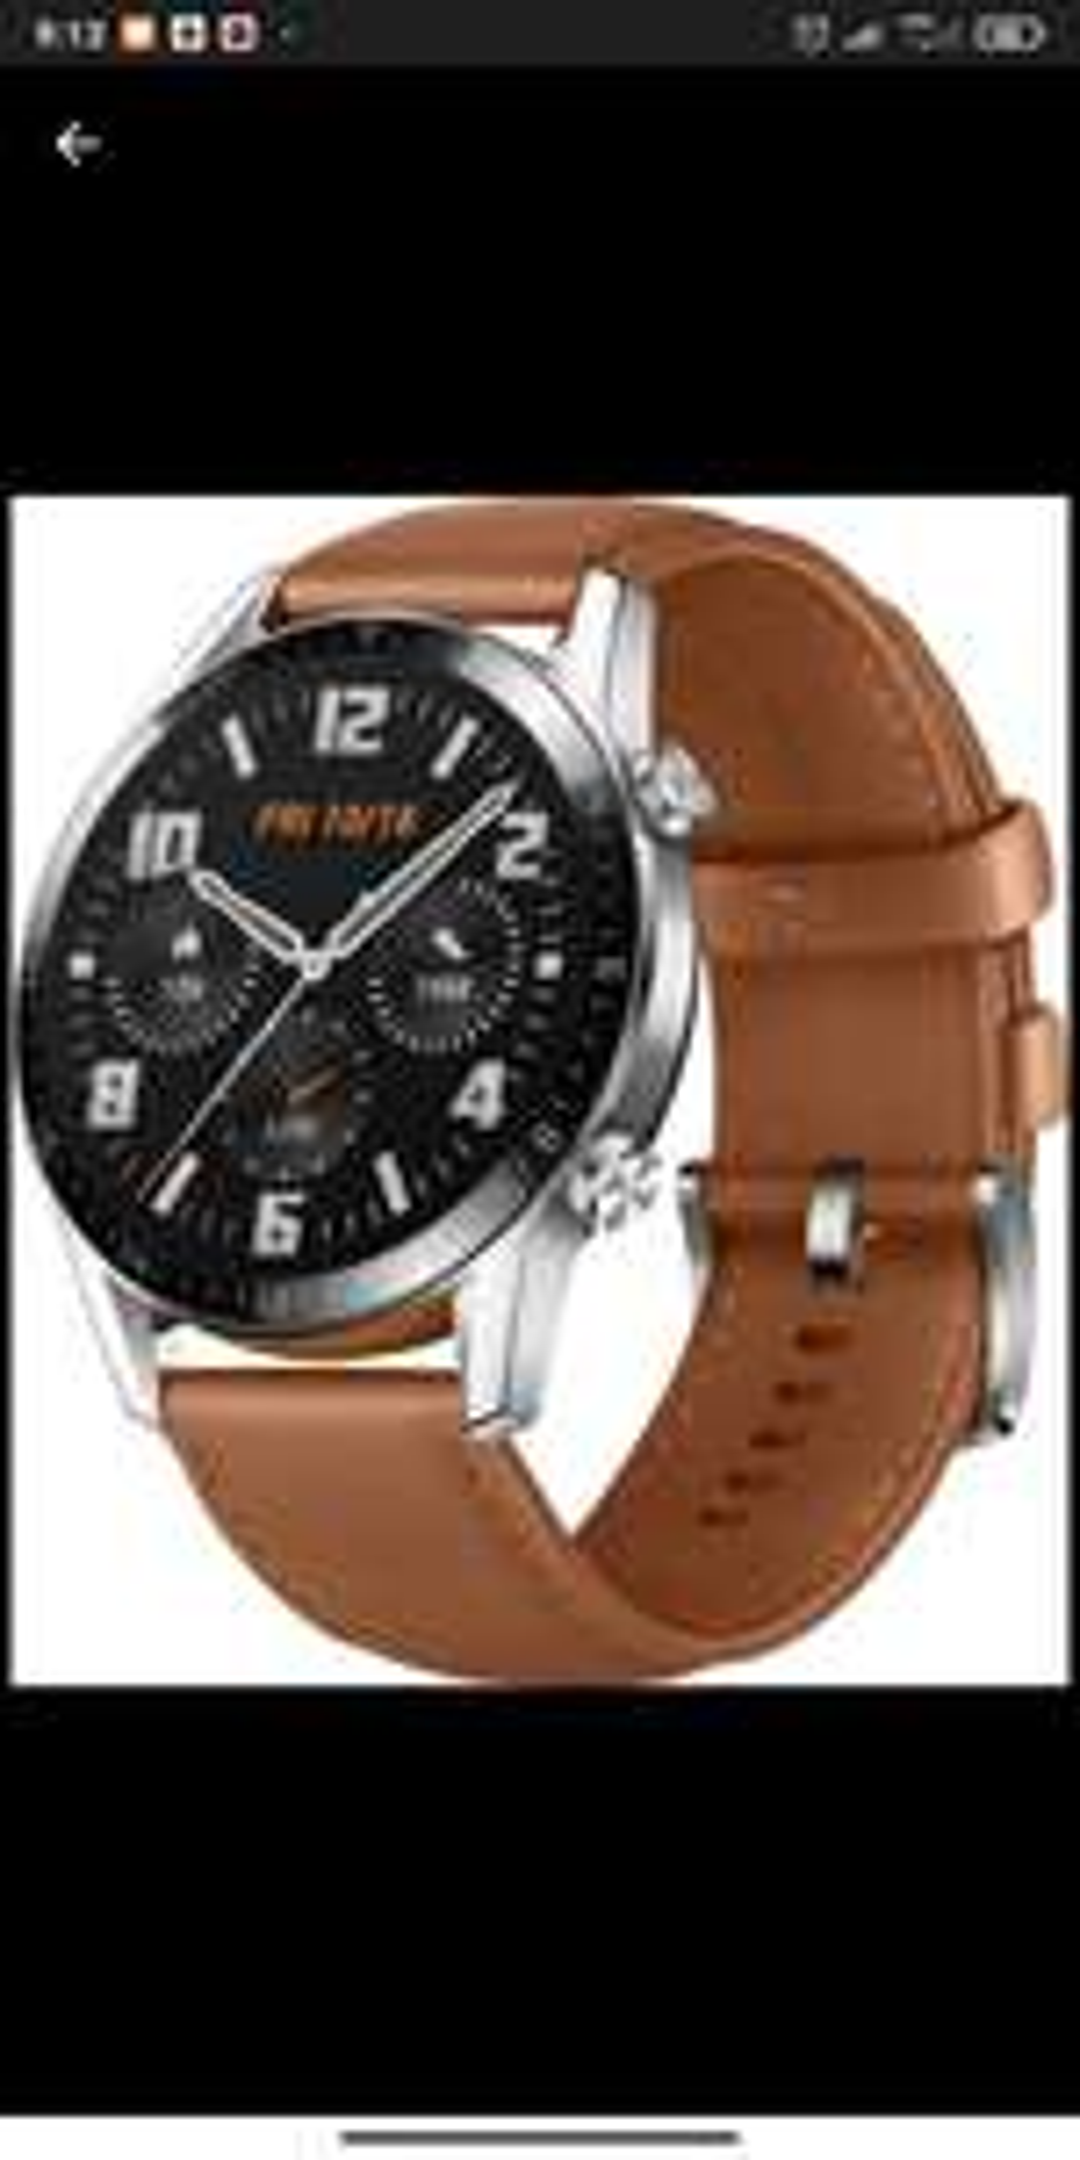 Smartwatch Huawei Watch GT 2 46mm Brązowy MORELE